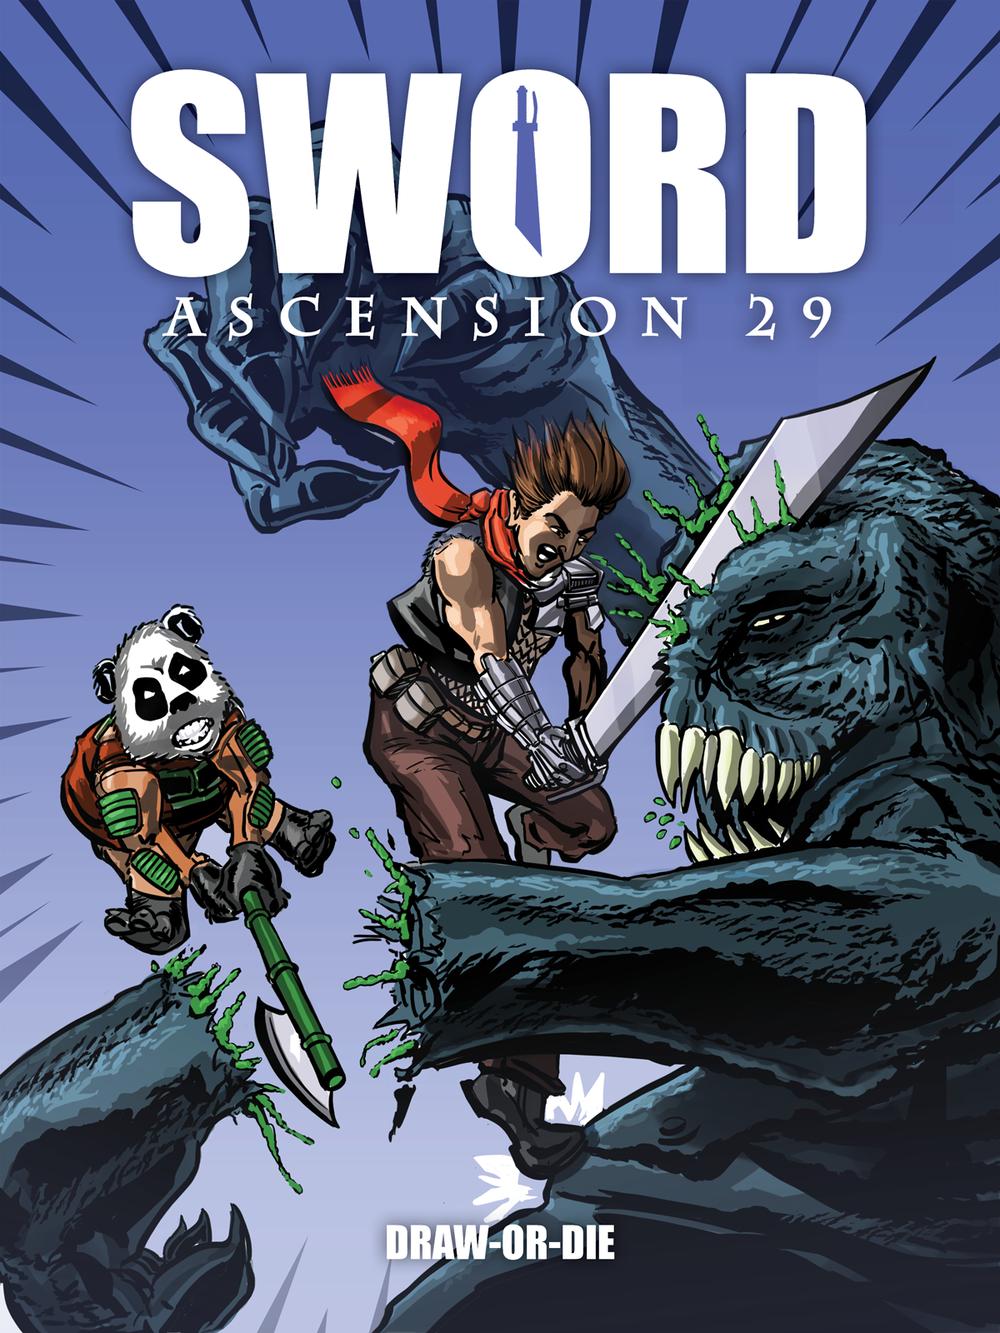 Ascension Challenge 29